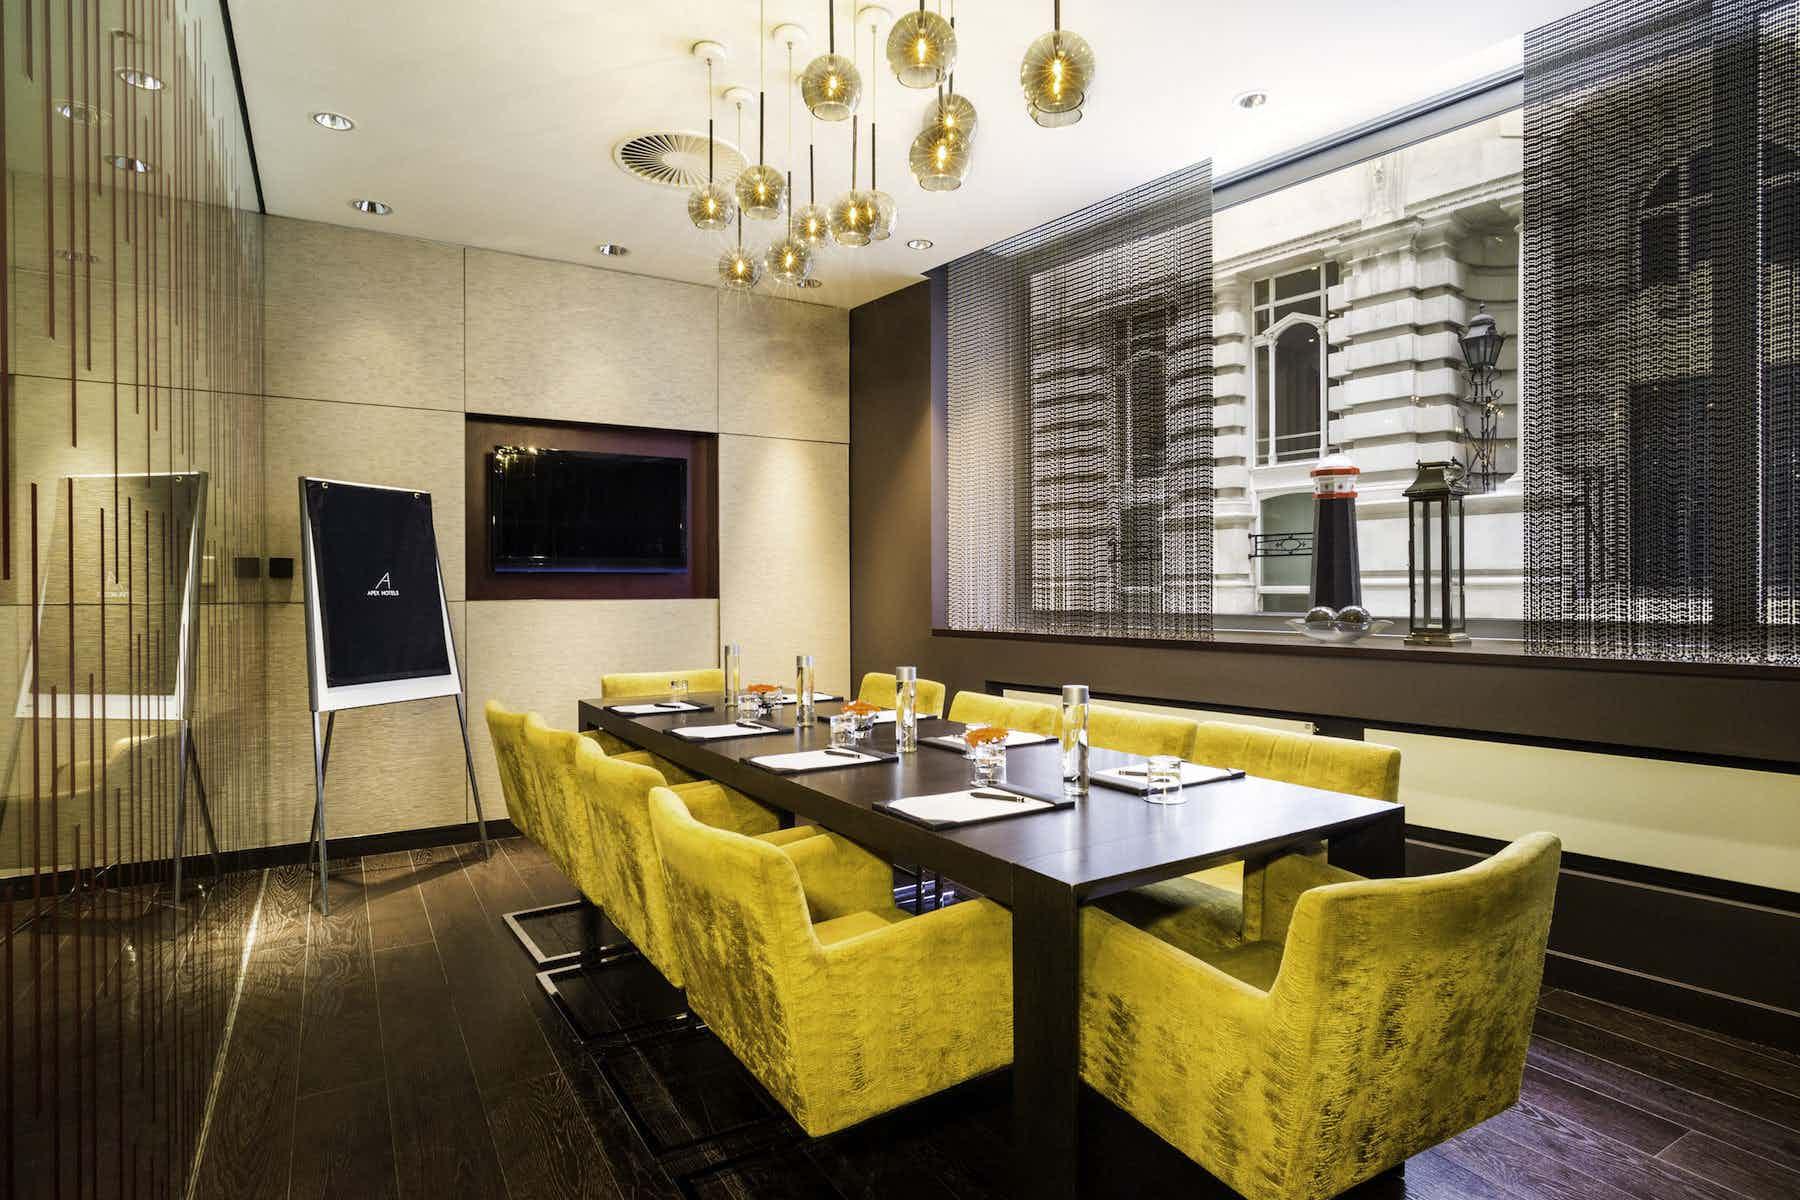 The London Room, Apex London Wall Hotel